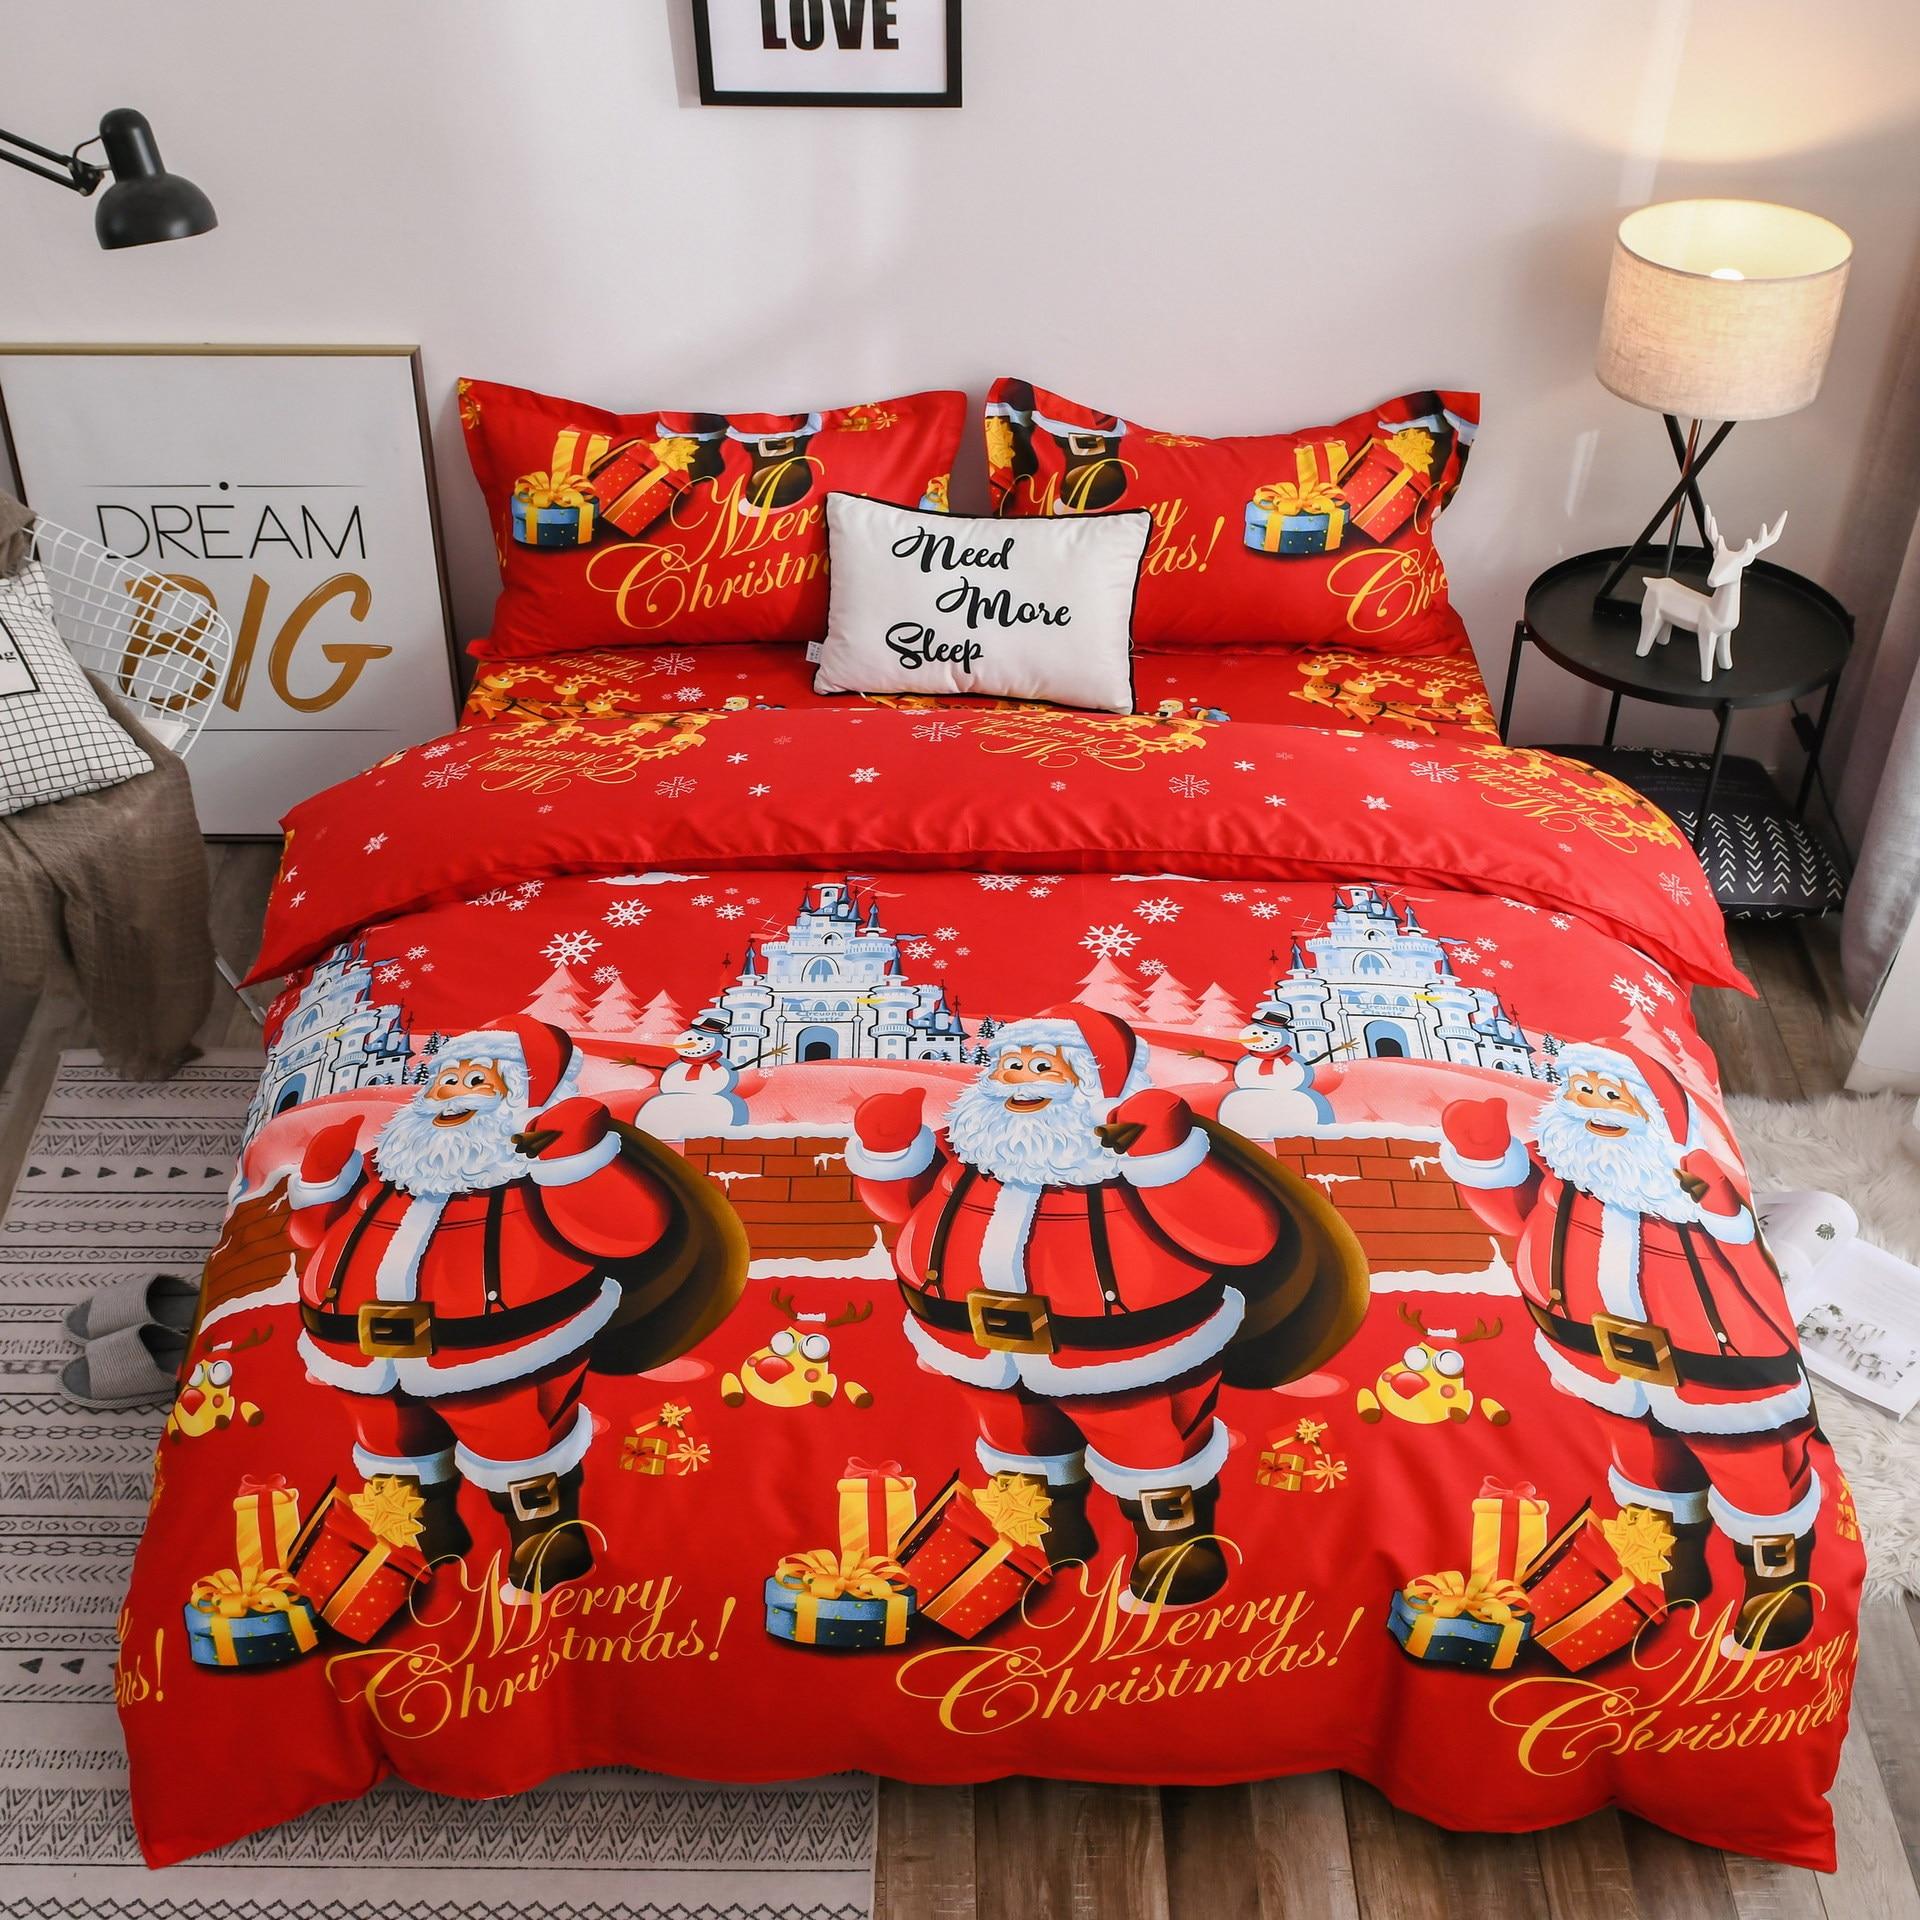 BEST.WENSD B21 Quality Super Soft Unicorn Bedding Cartoon Duvet Cover Set 3D Dinosaur World Bed Set 2/3pcs Twin Kids Bedding Set